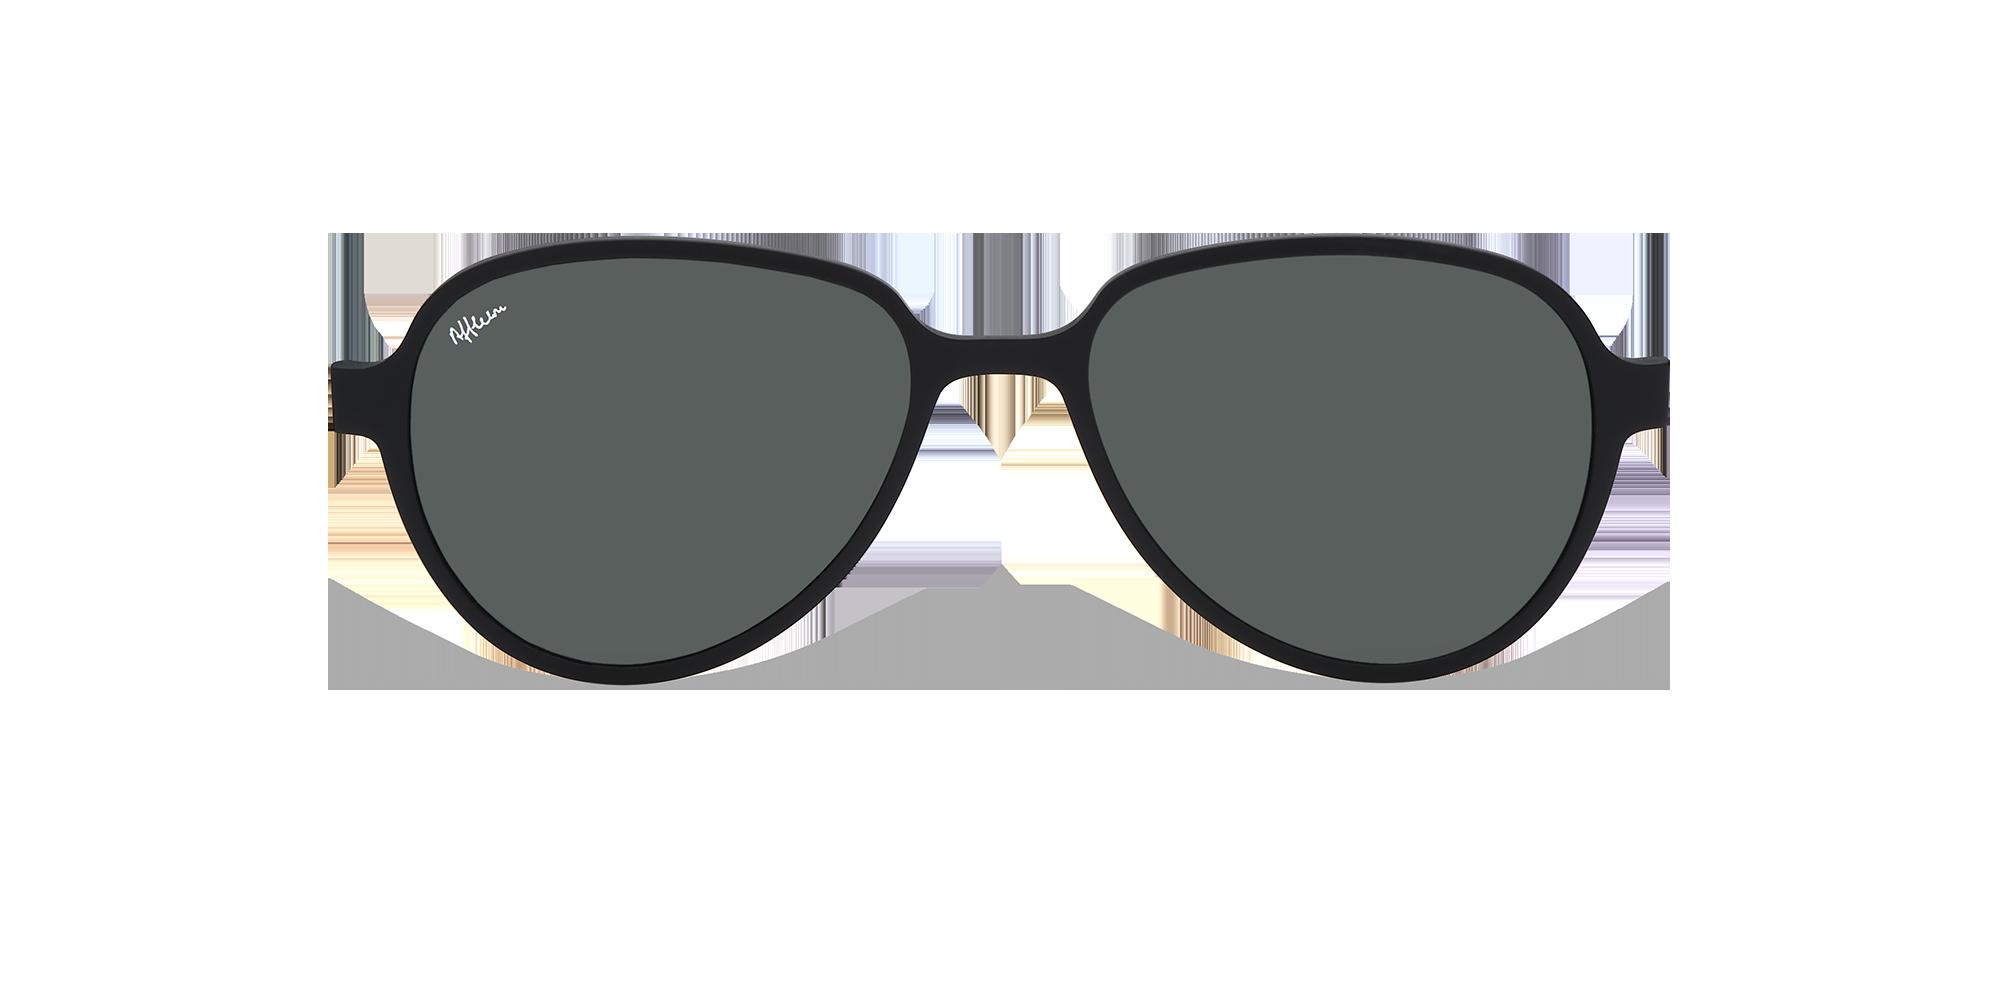 afflelou/france/products/smart_clip/clips_glasses/TMK43SUBK015417.png